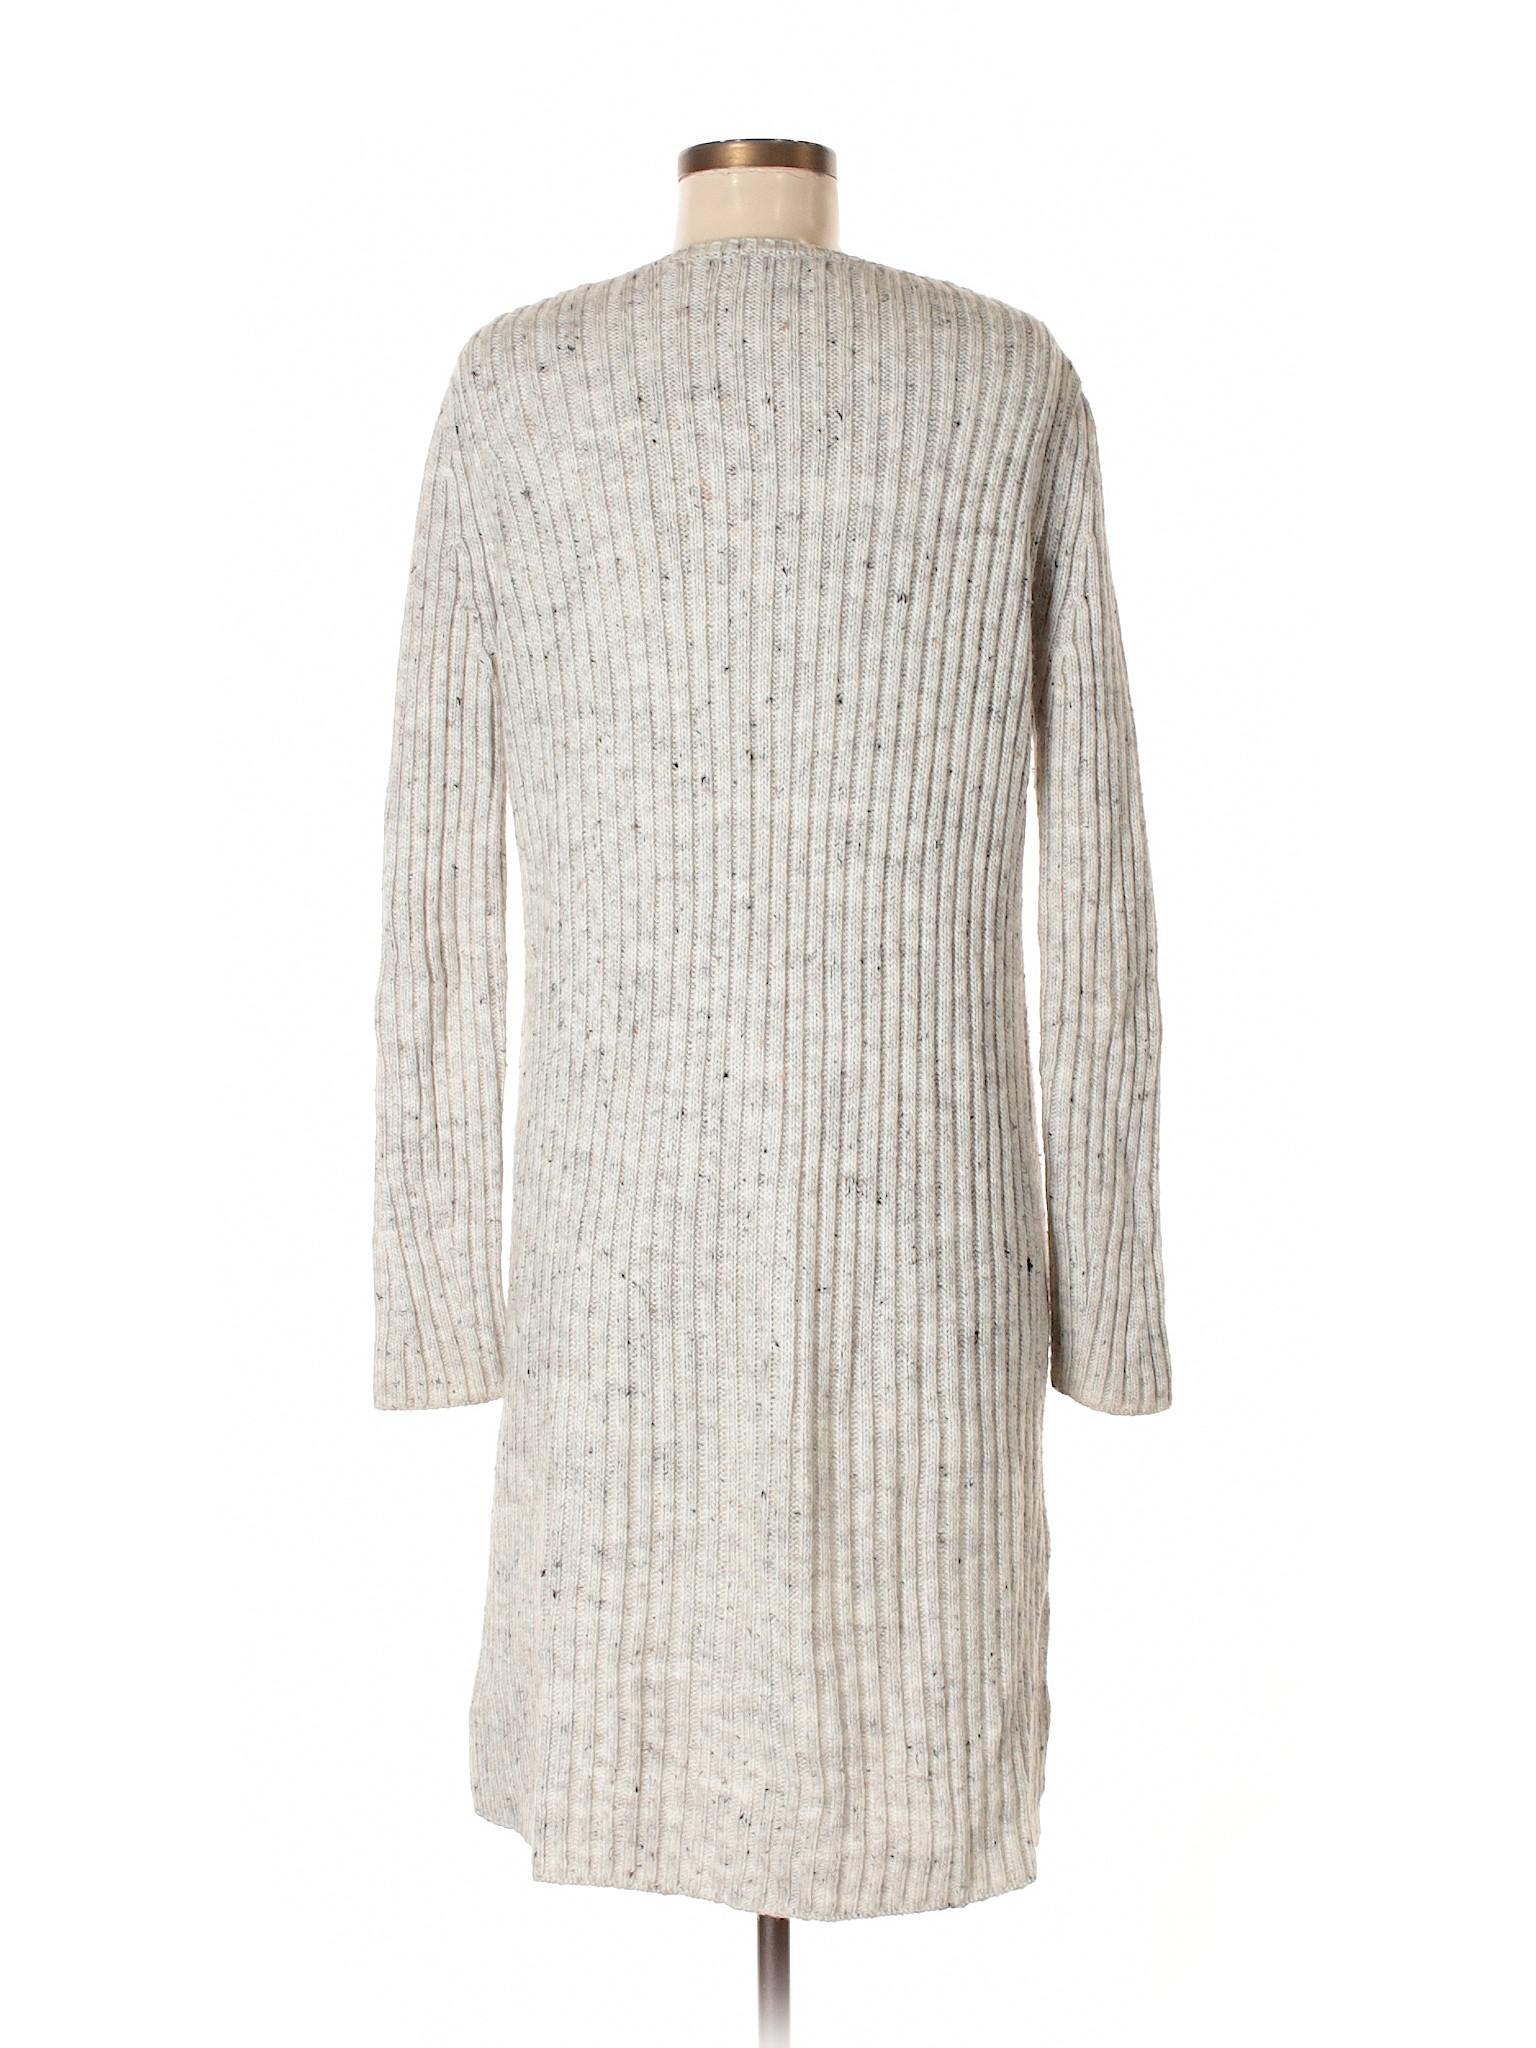 Boutique winter winter Zara Dress Casual Boutique Zara rCqr8